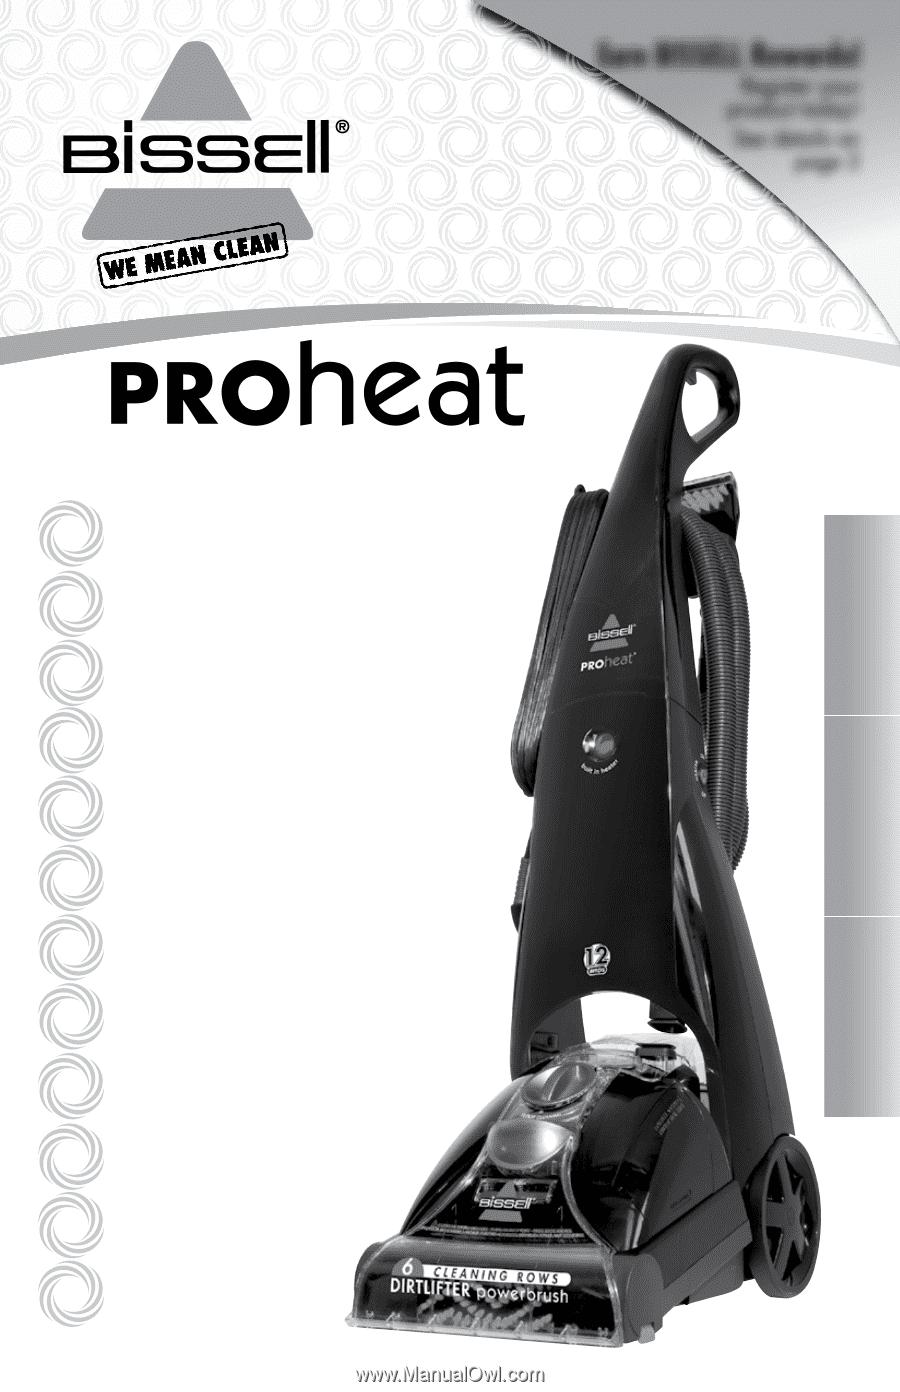 bissell proheat 12 amp manual pdf